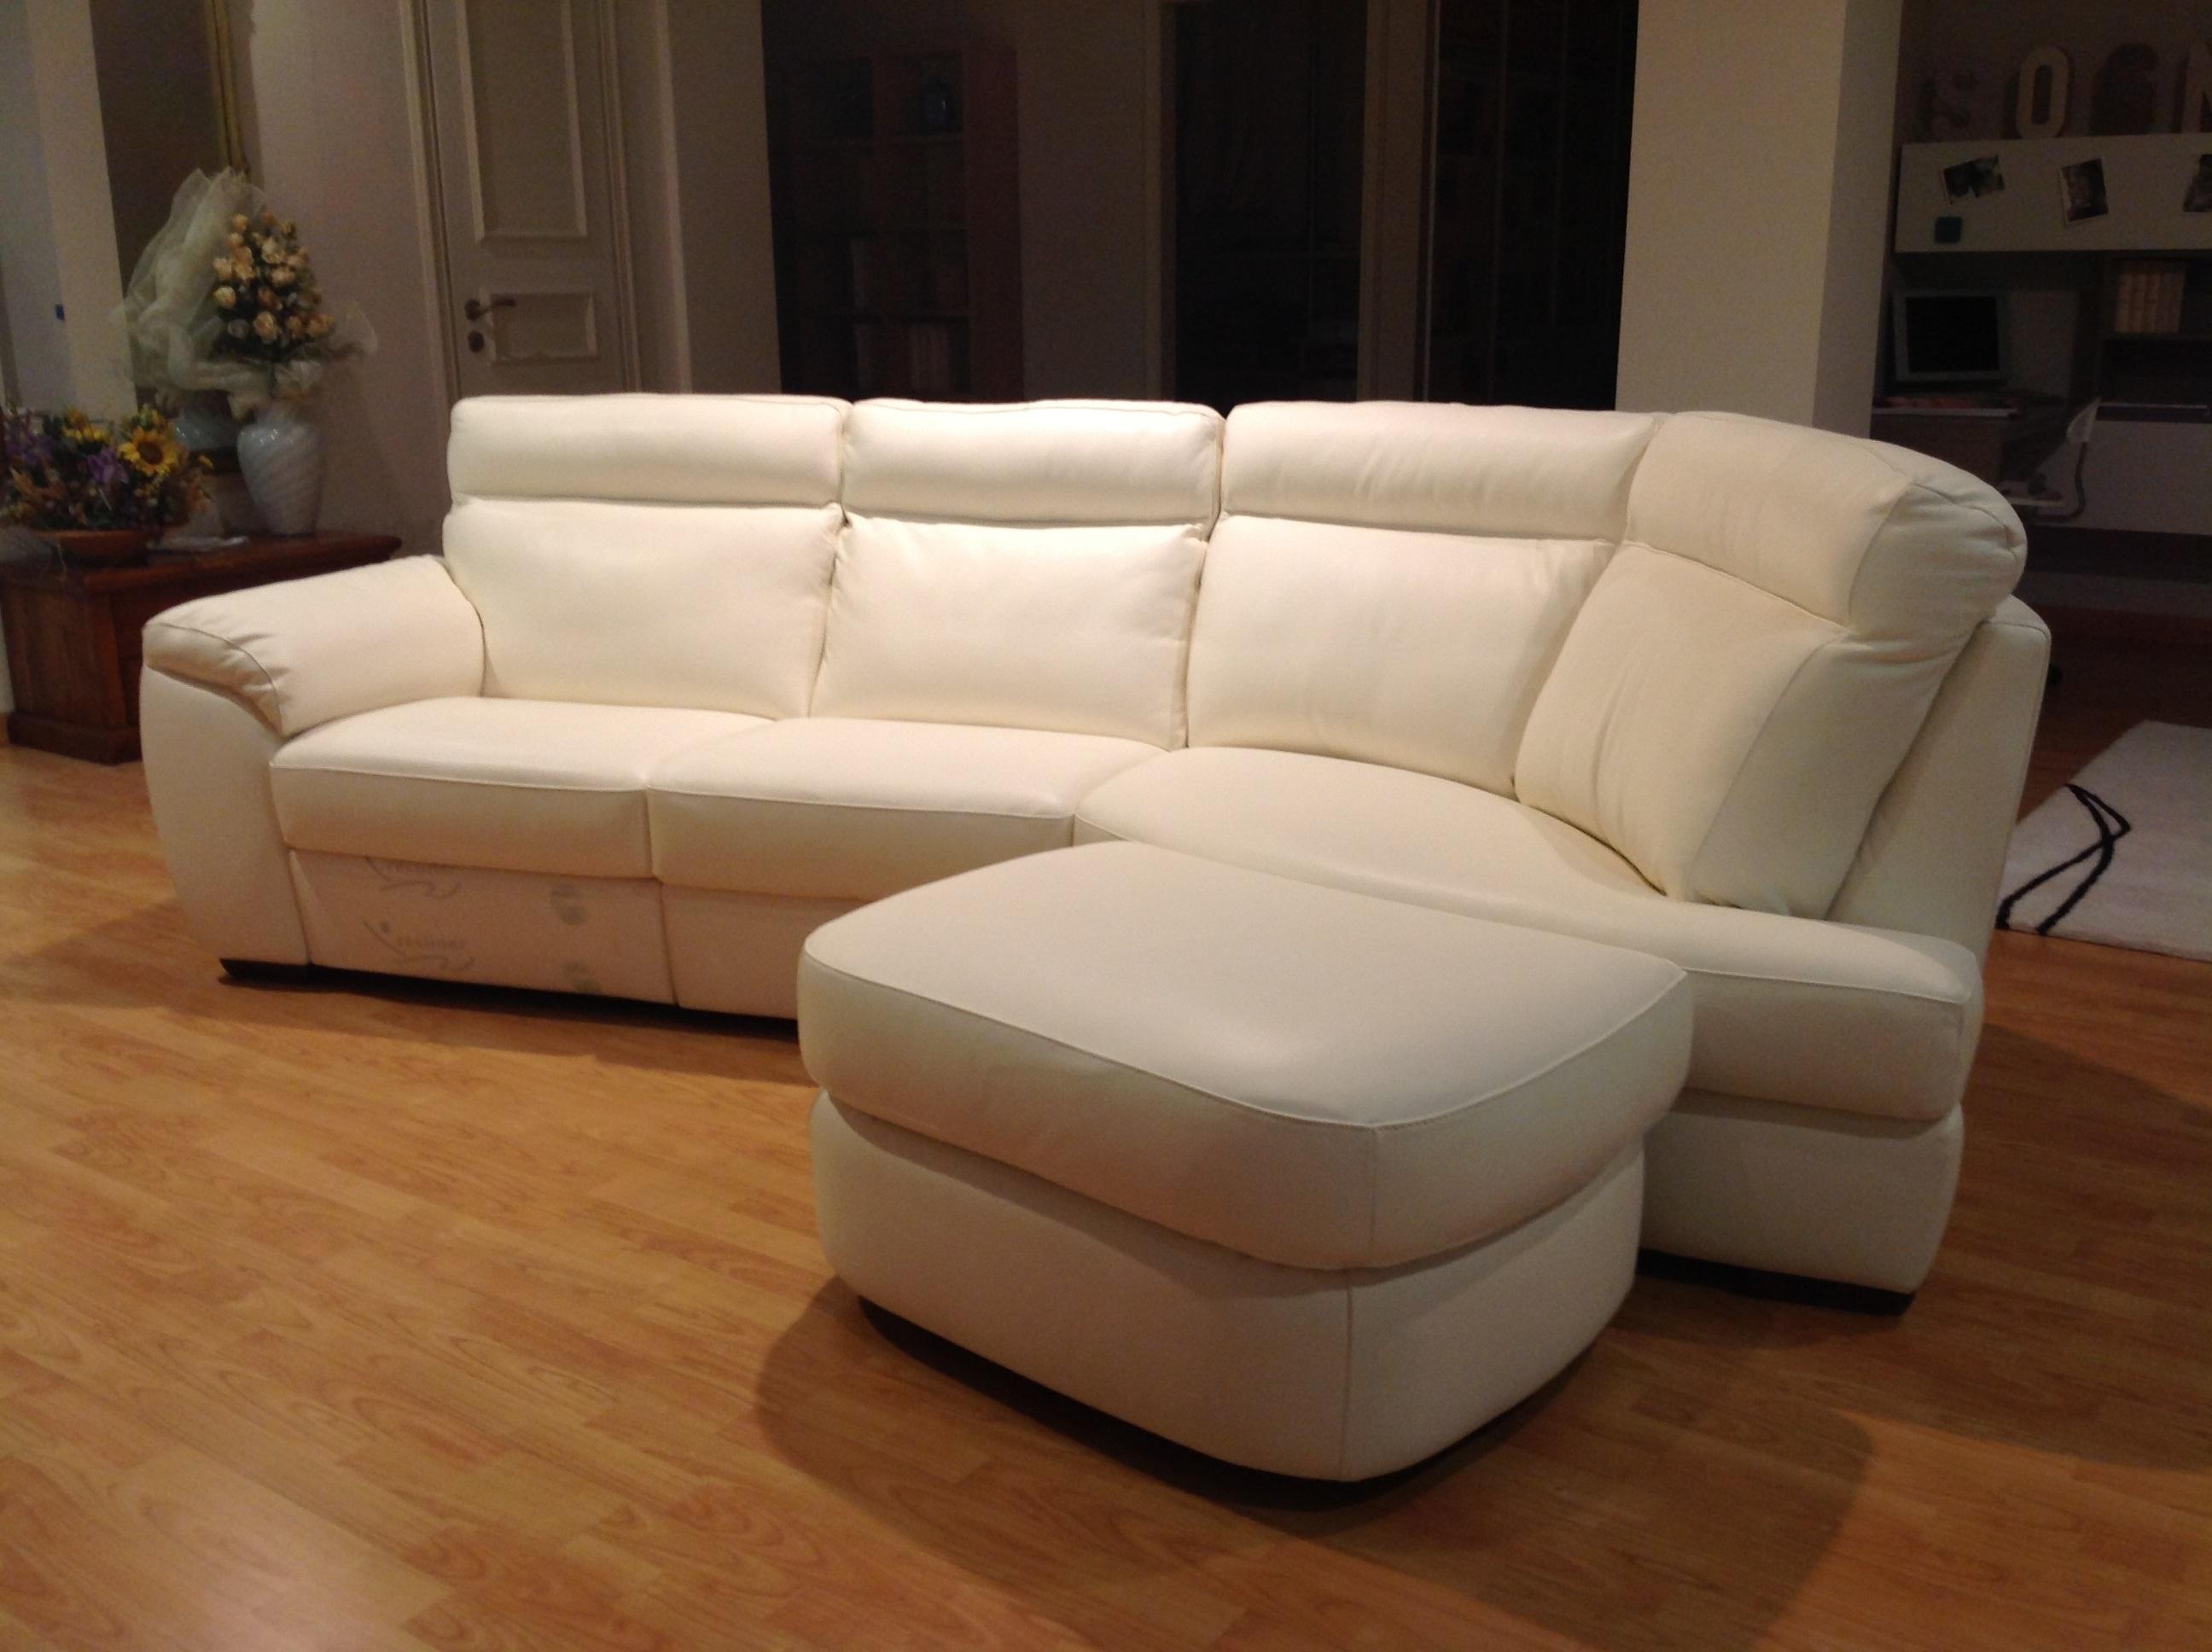 Divani Doimo Offerte : Divano doimo sofas charles scontato del divani a